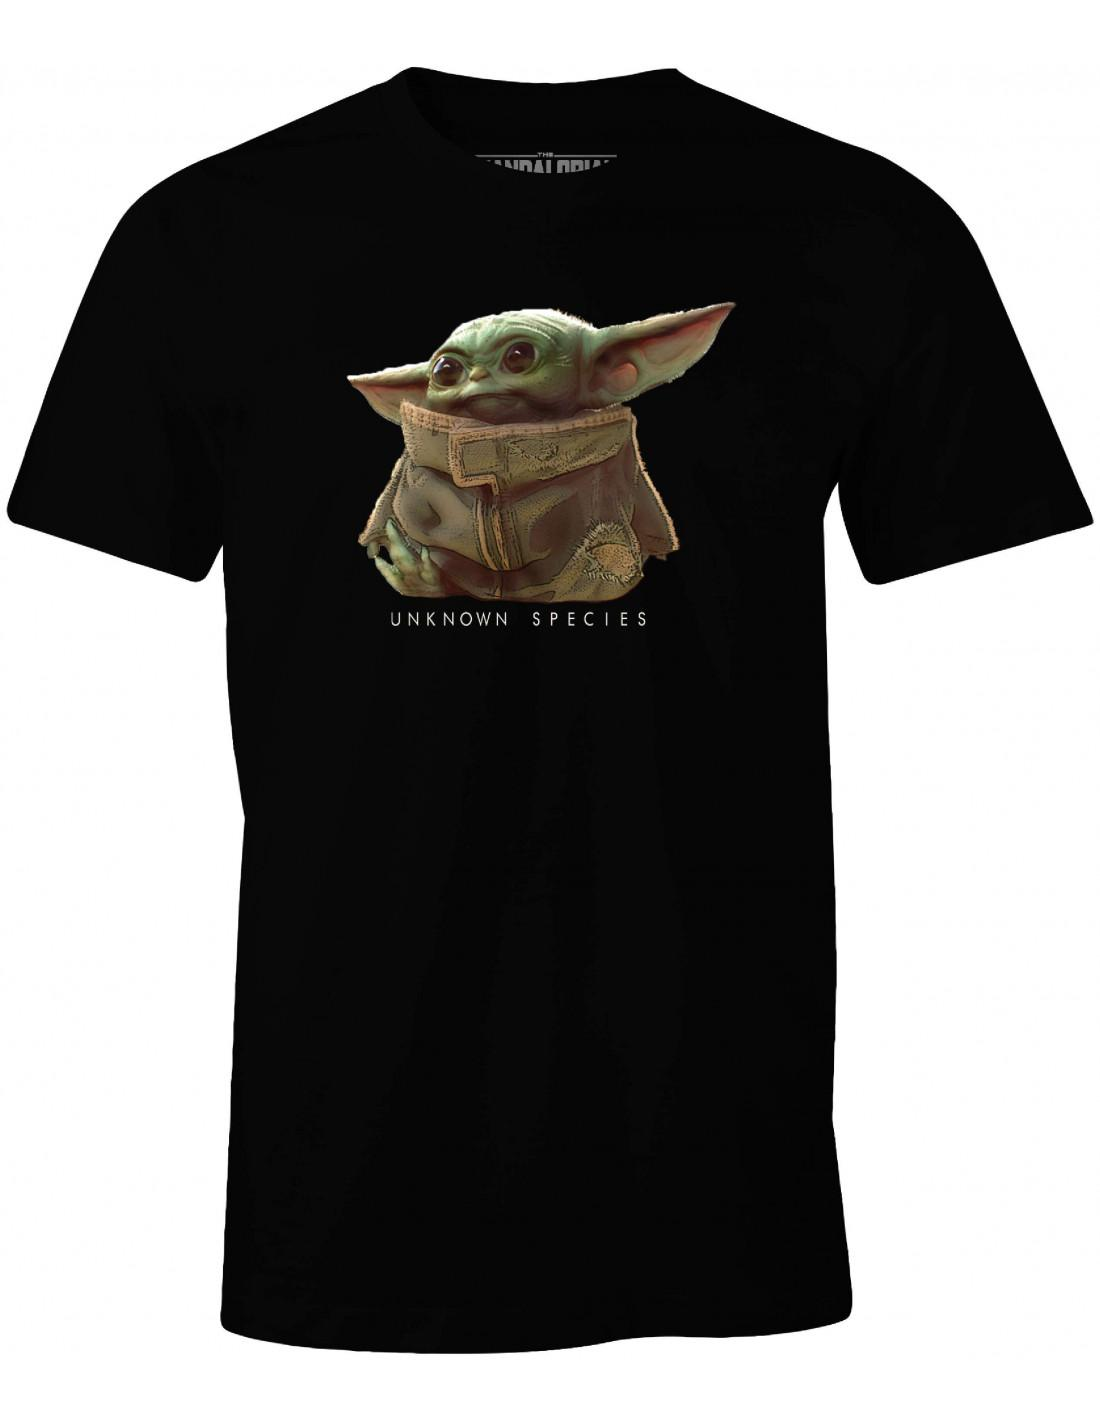 T shirt star wars the mandalorian baby yoda unkown species